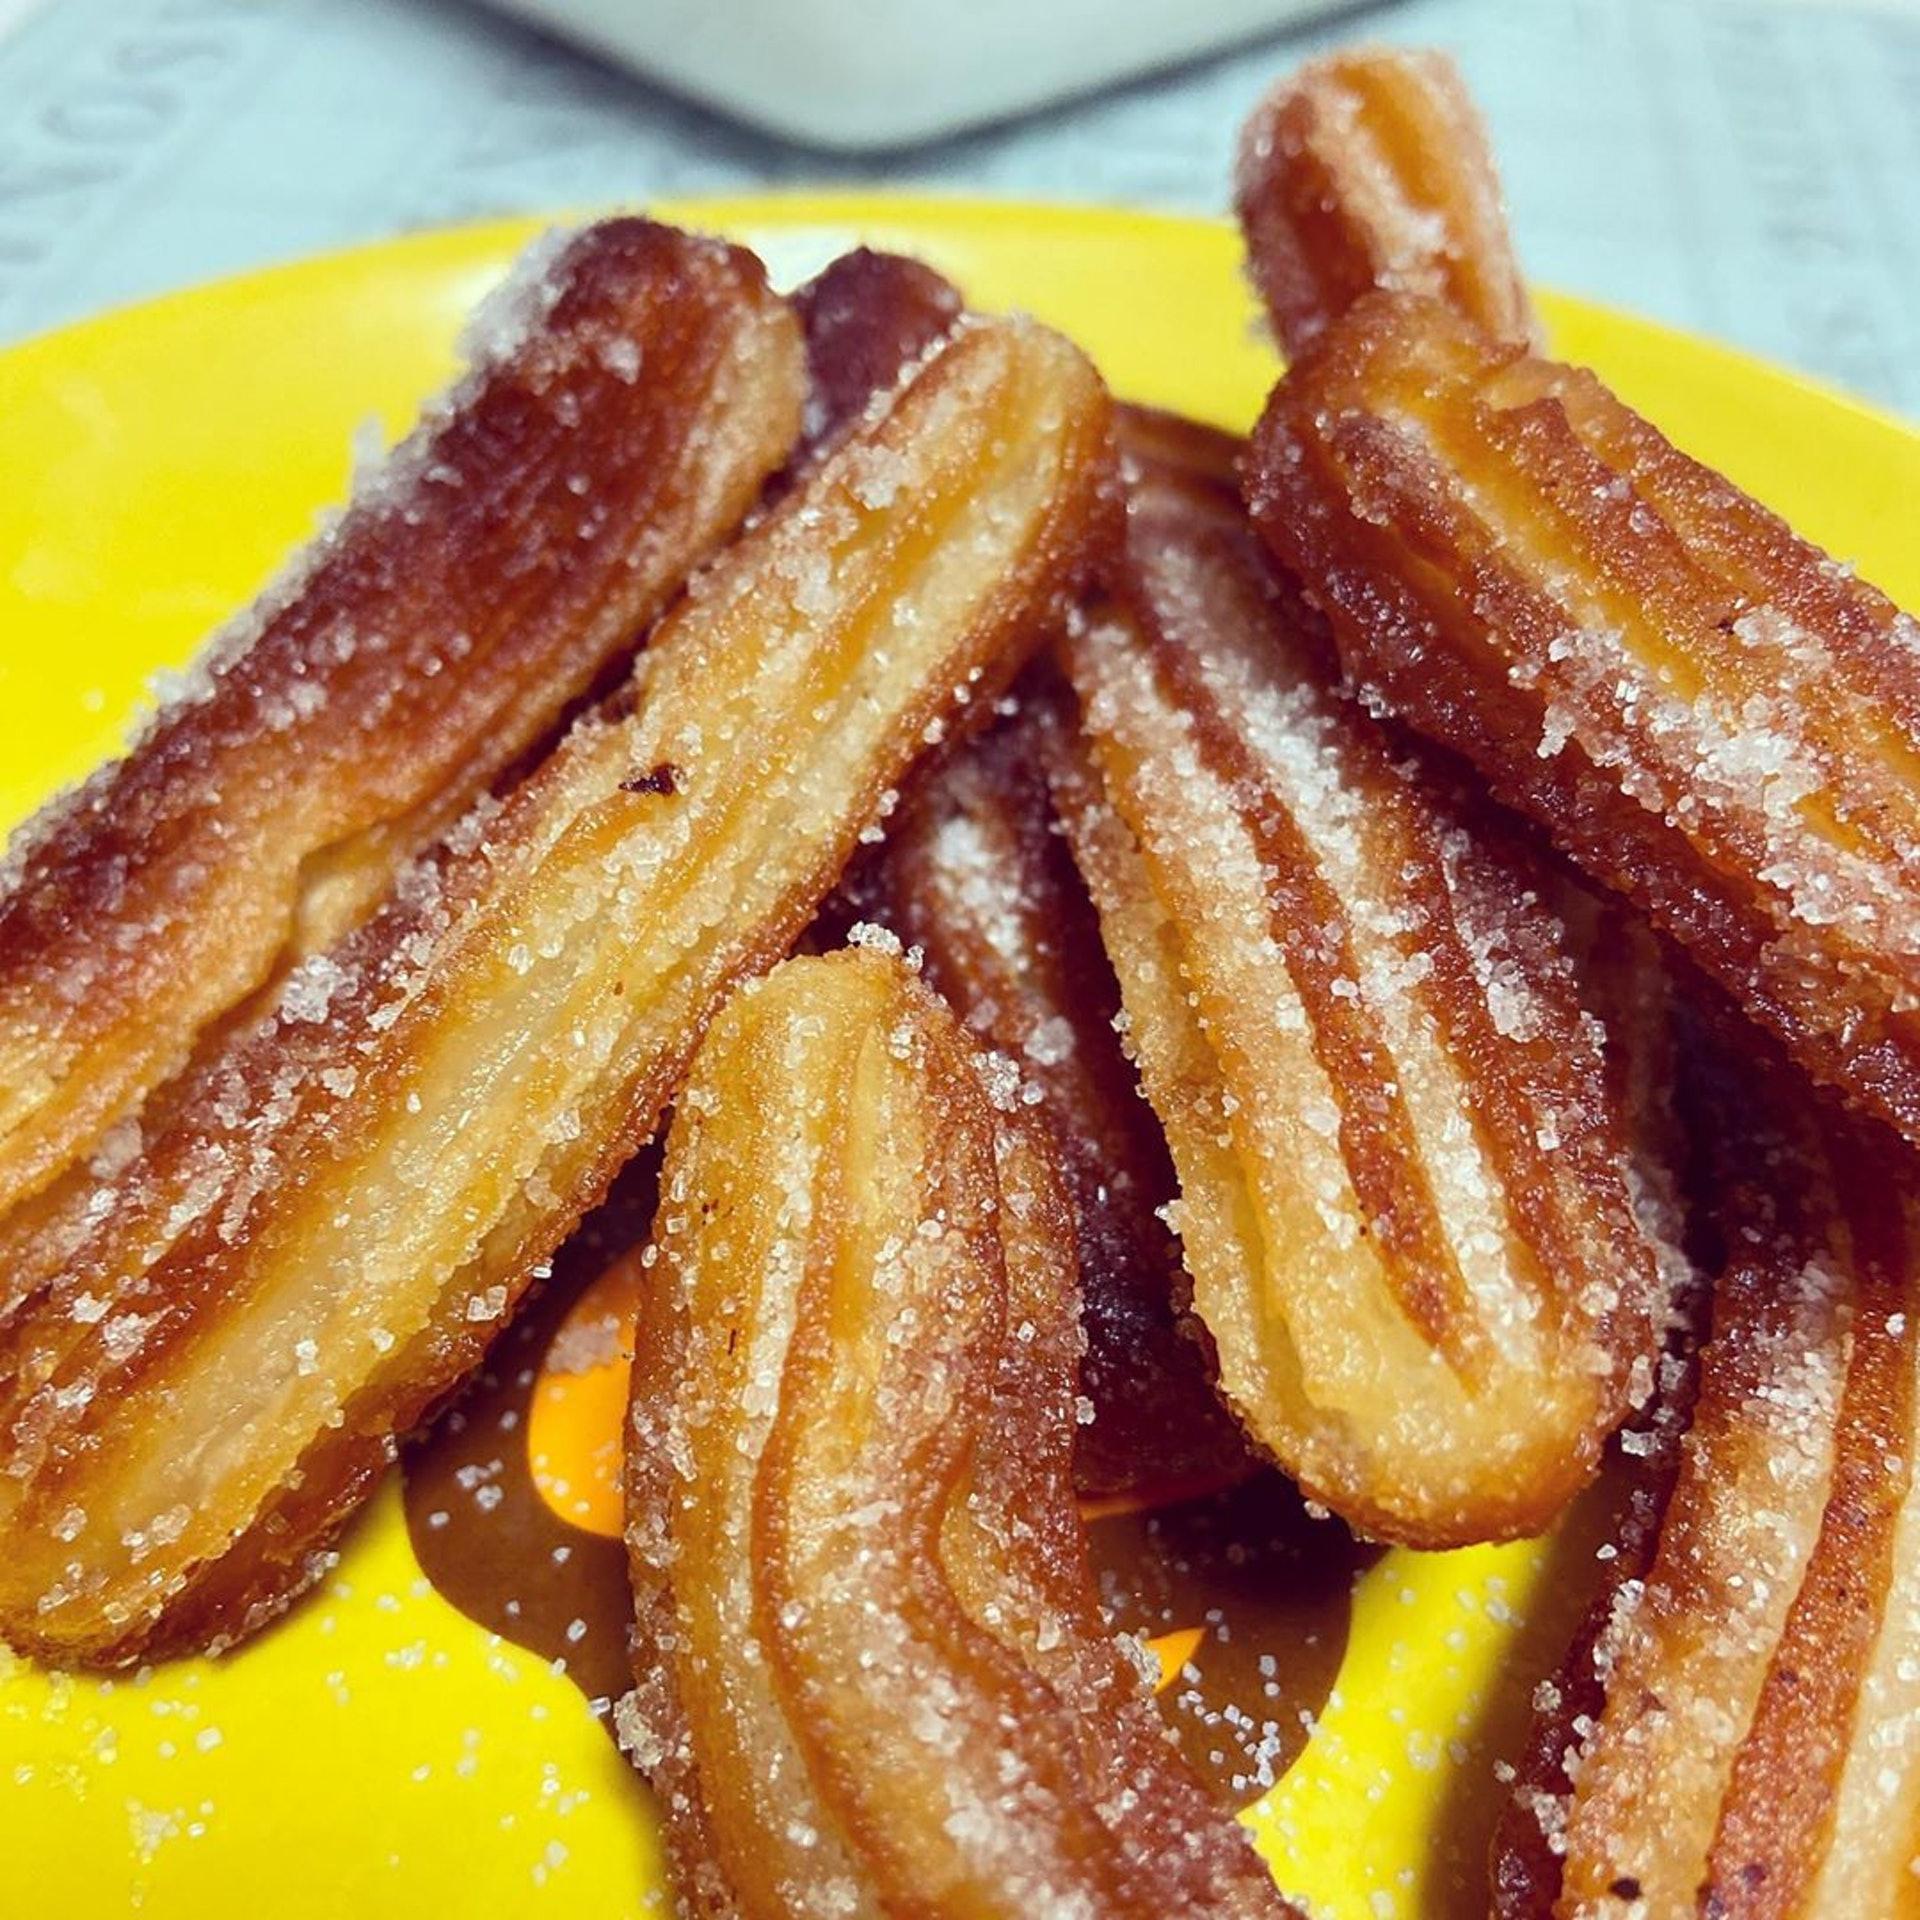 【2】Churros非常香脆和香甜。(ig@ tmikau)